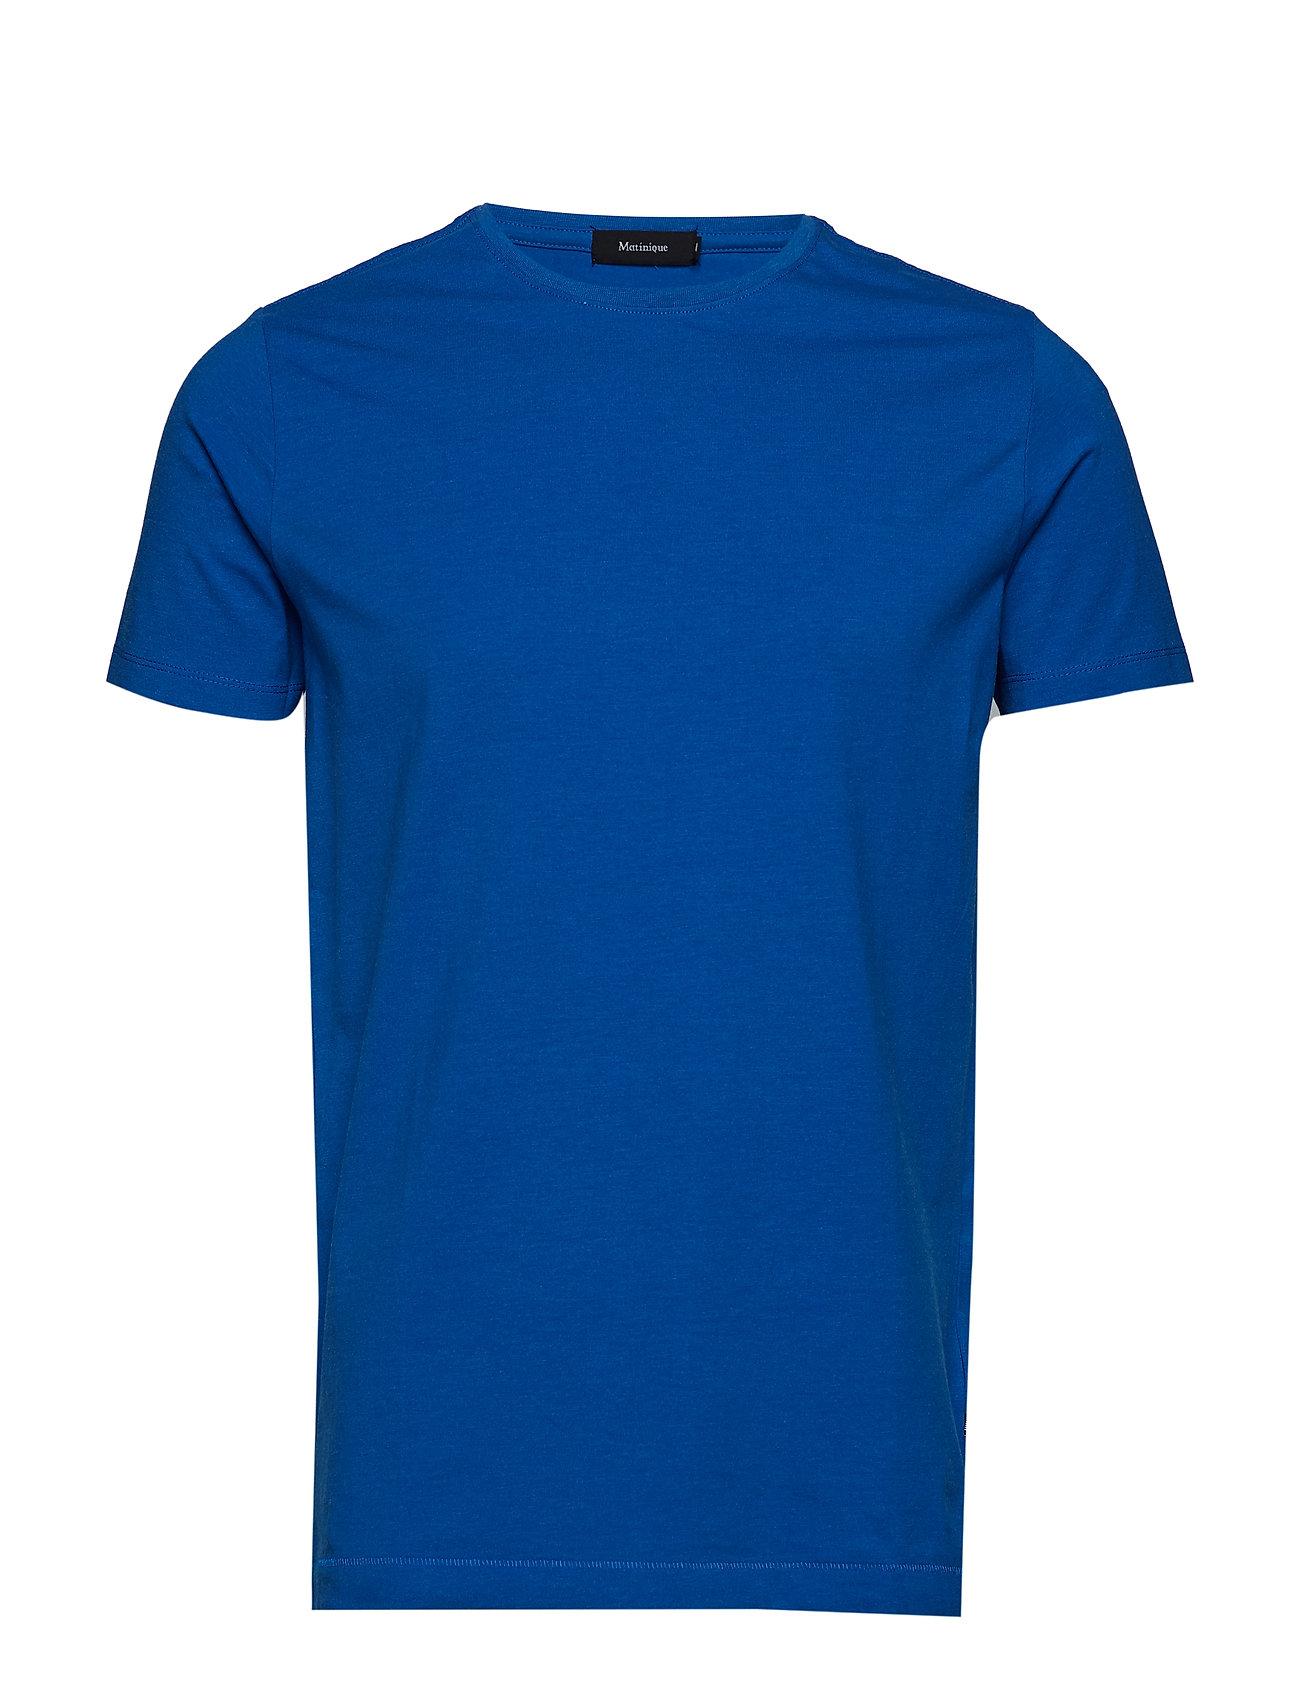 Matinique Jermalink - SHARP BLUE